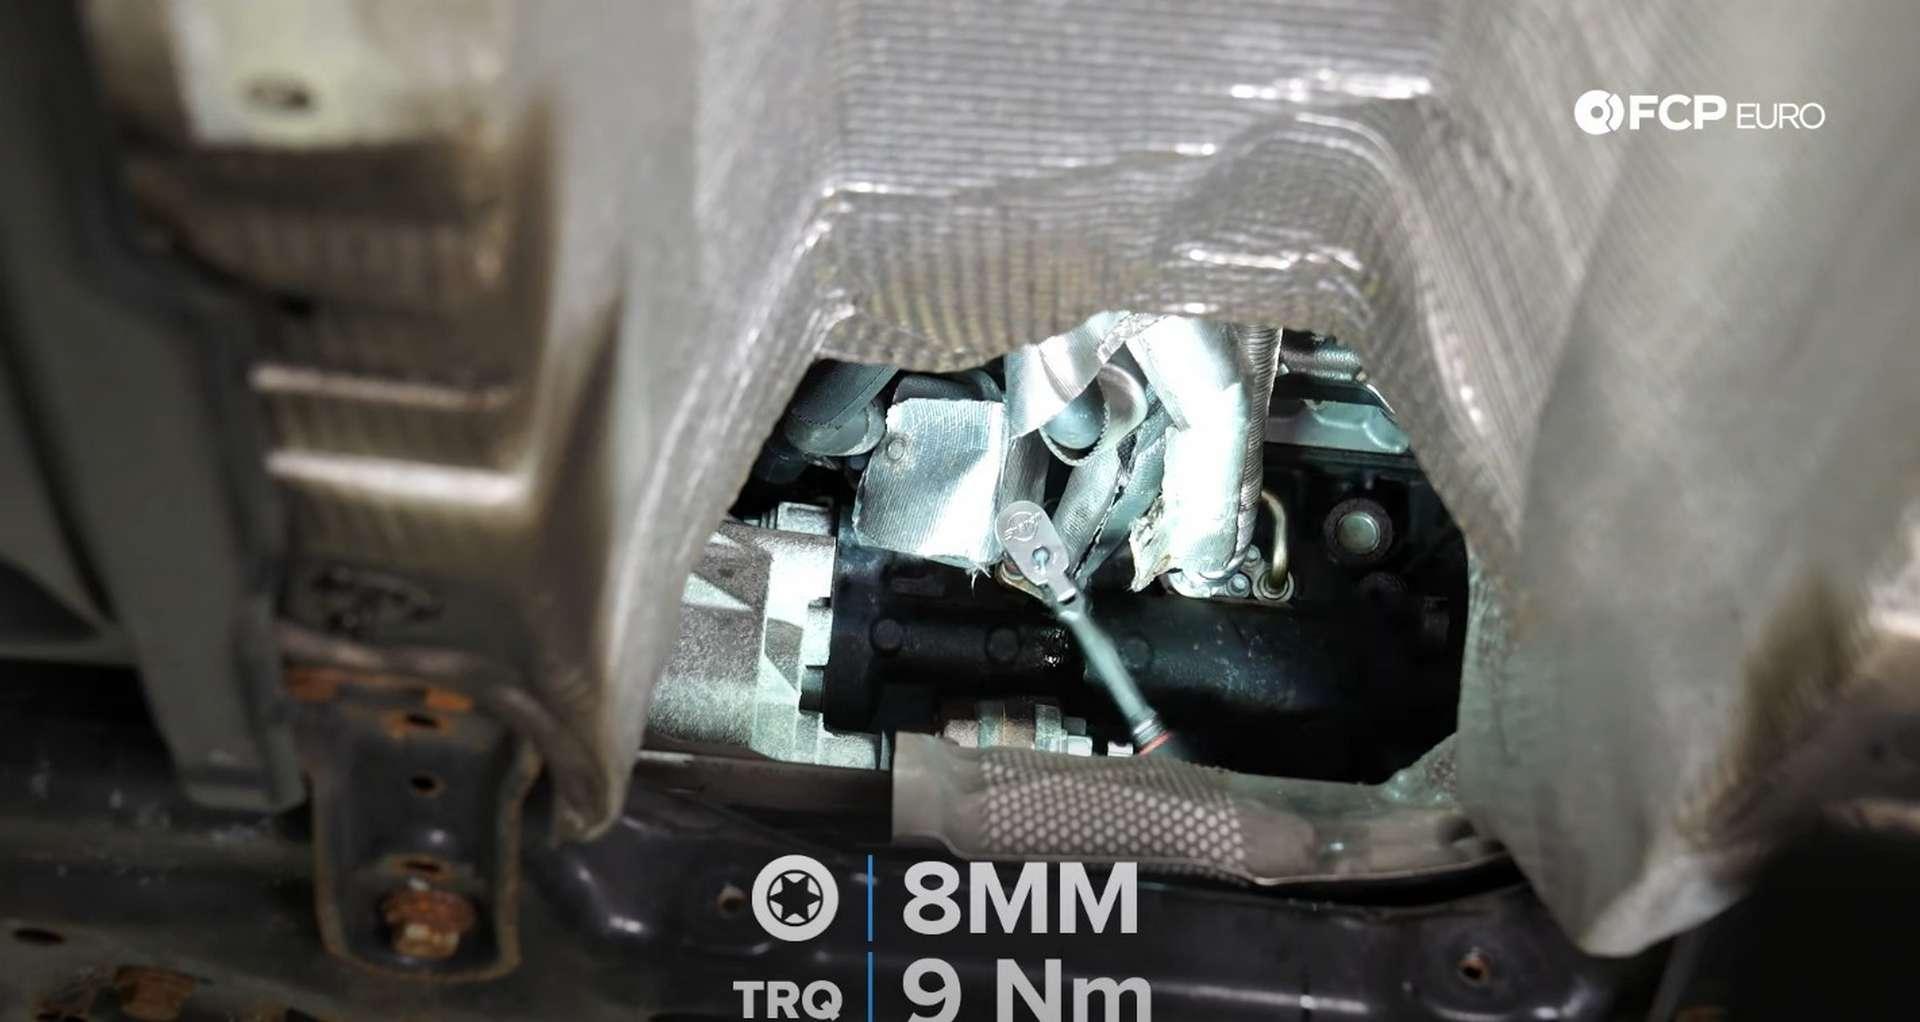 DIY MK7 VW GTI Turbocharger Upgrade installing the oil return line